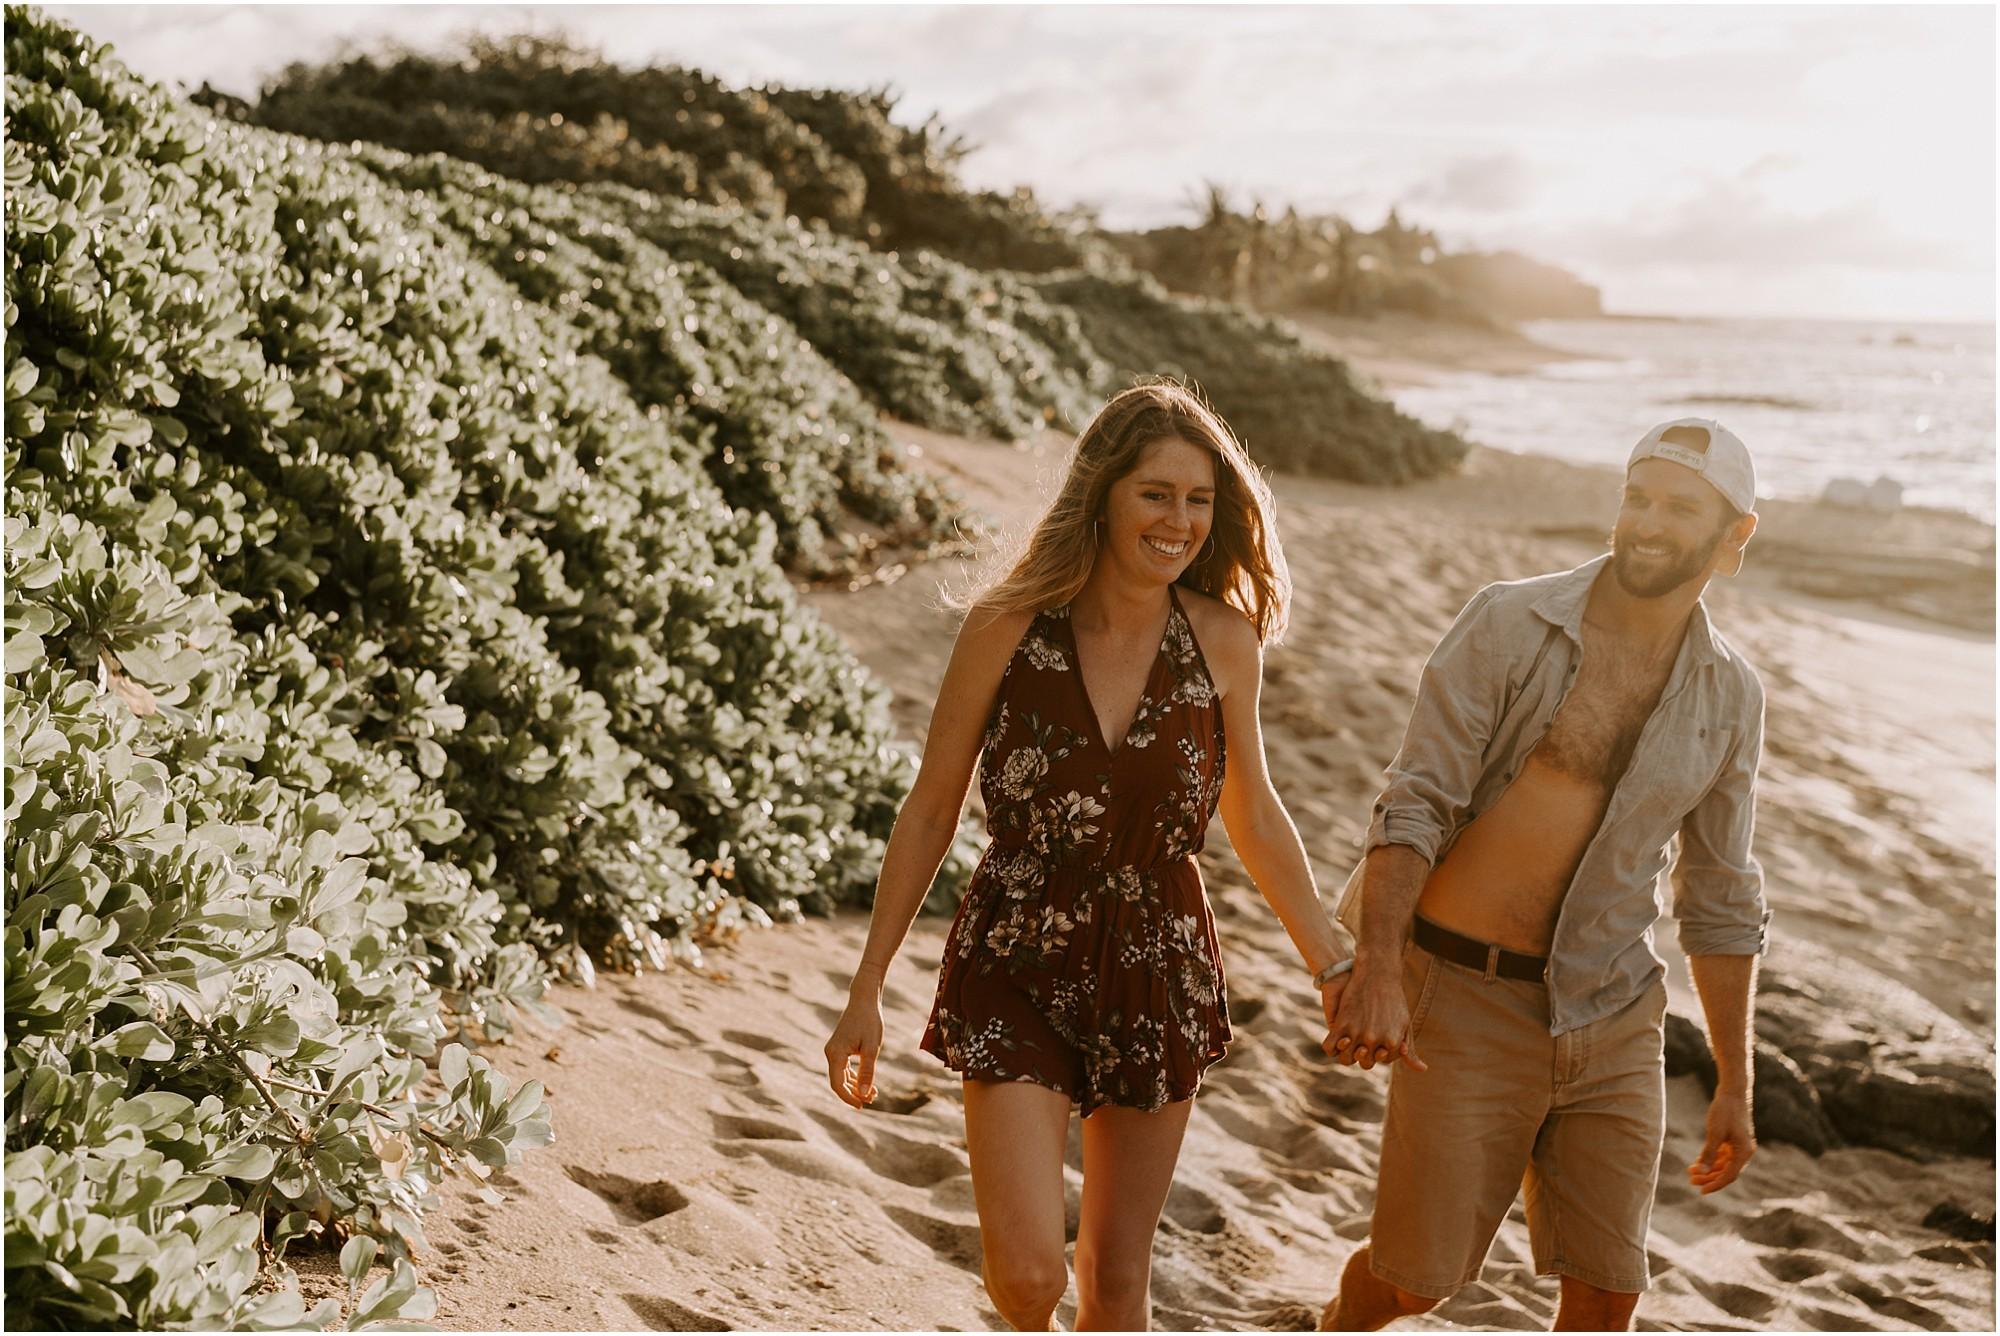 destination-elopement-photography-hawaii-photos-by-aloha-zoe-photography_0012.jpg